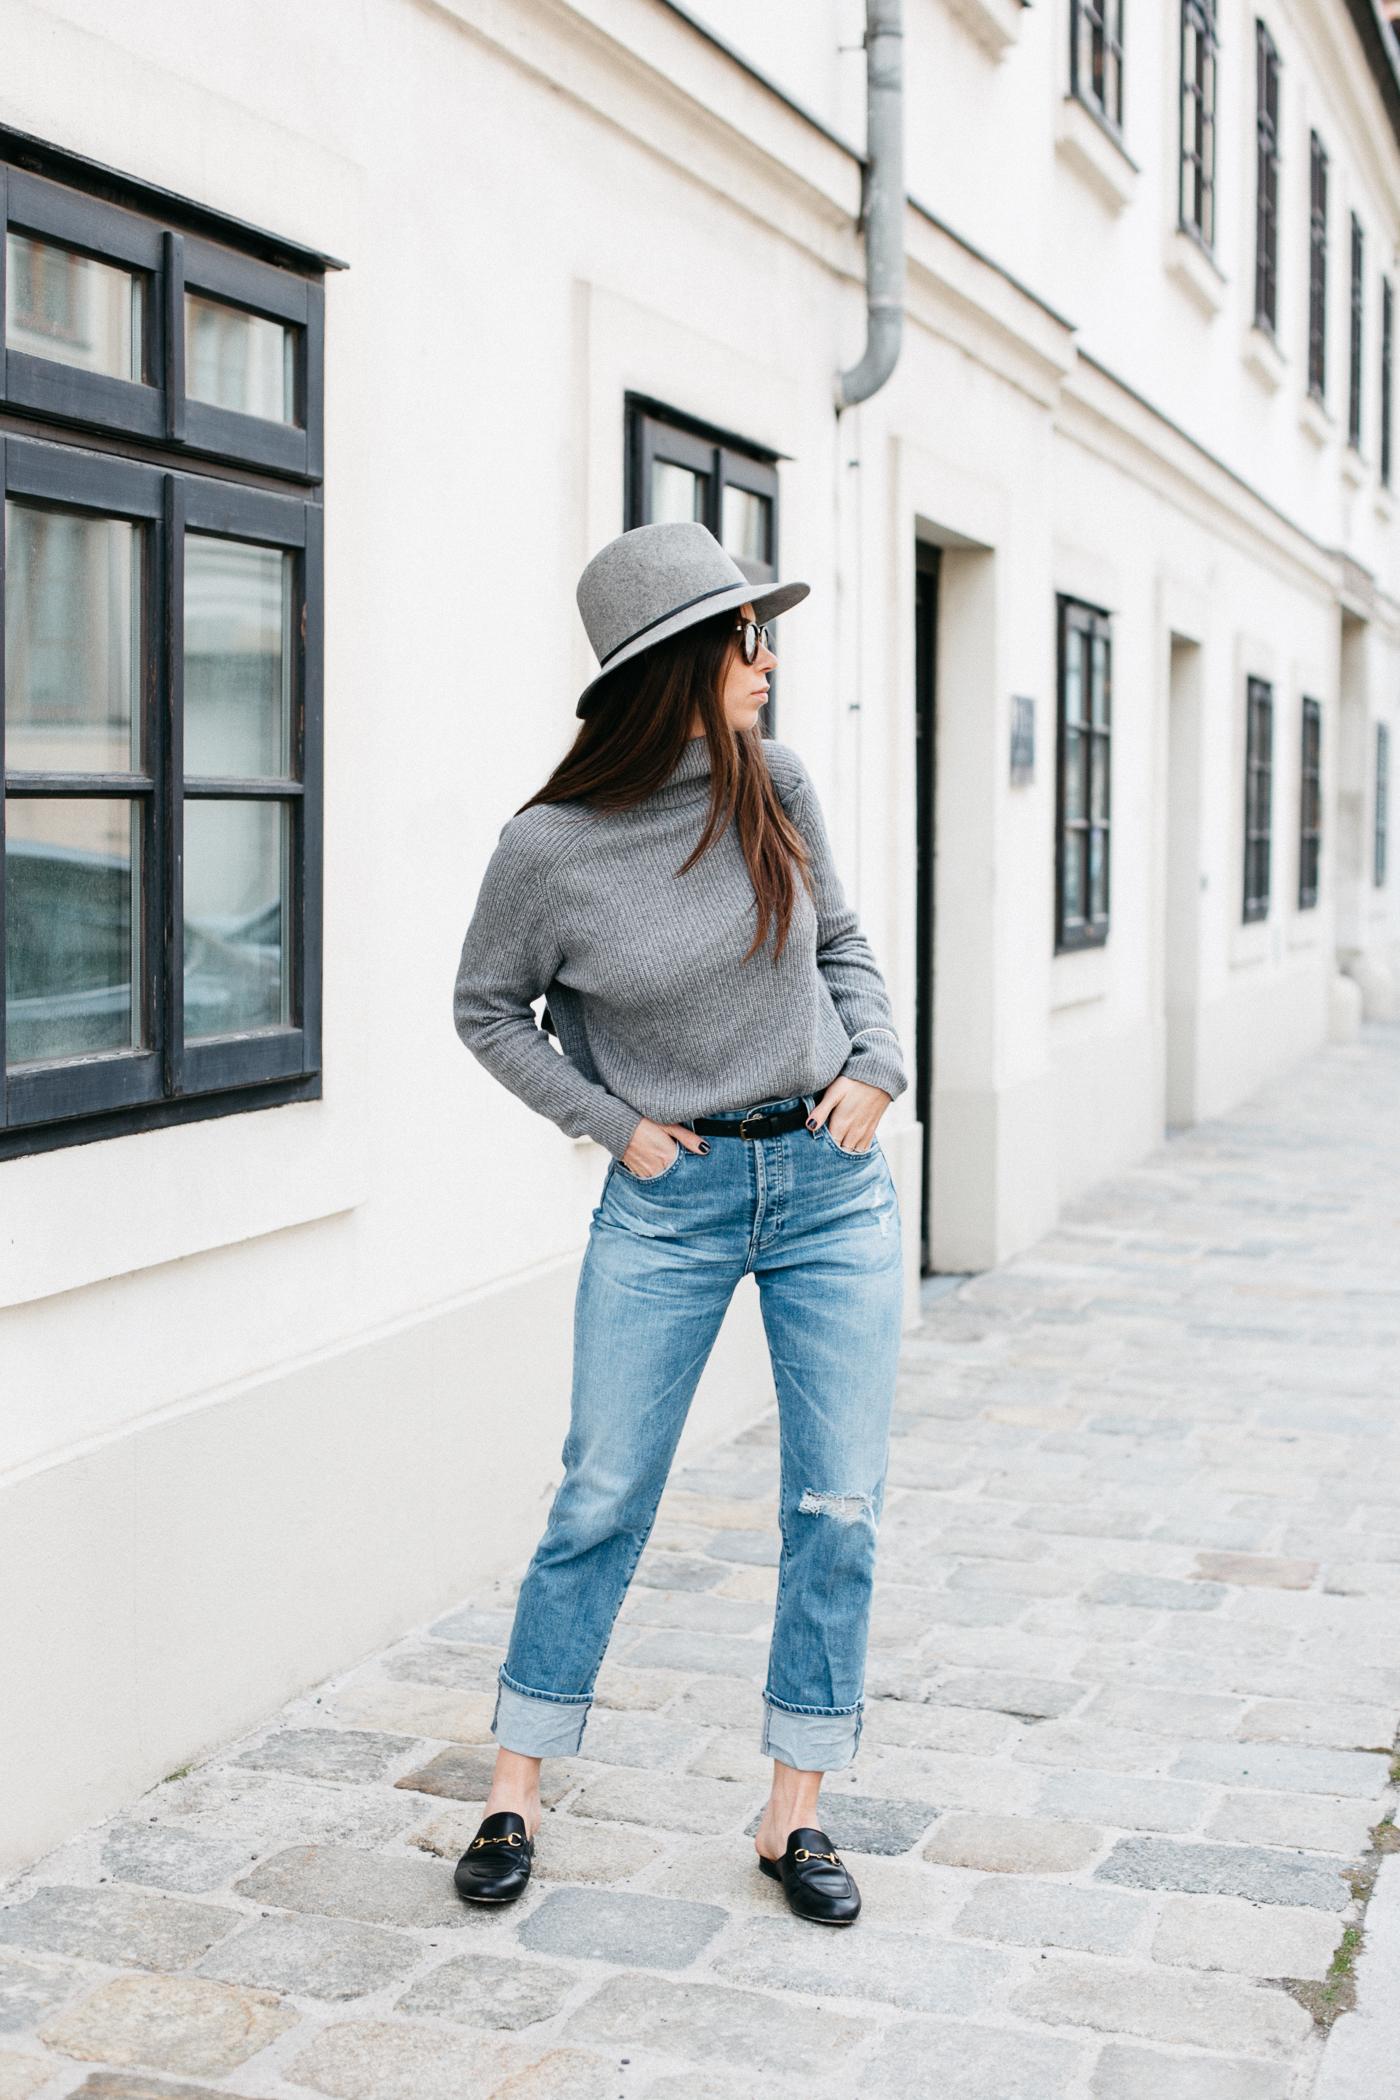 954298215d0ea4 OUTFIT: basics + a hat. | Bikinis & Passports | Bloglovin'